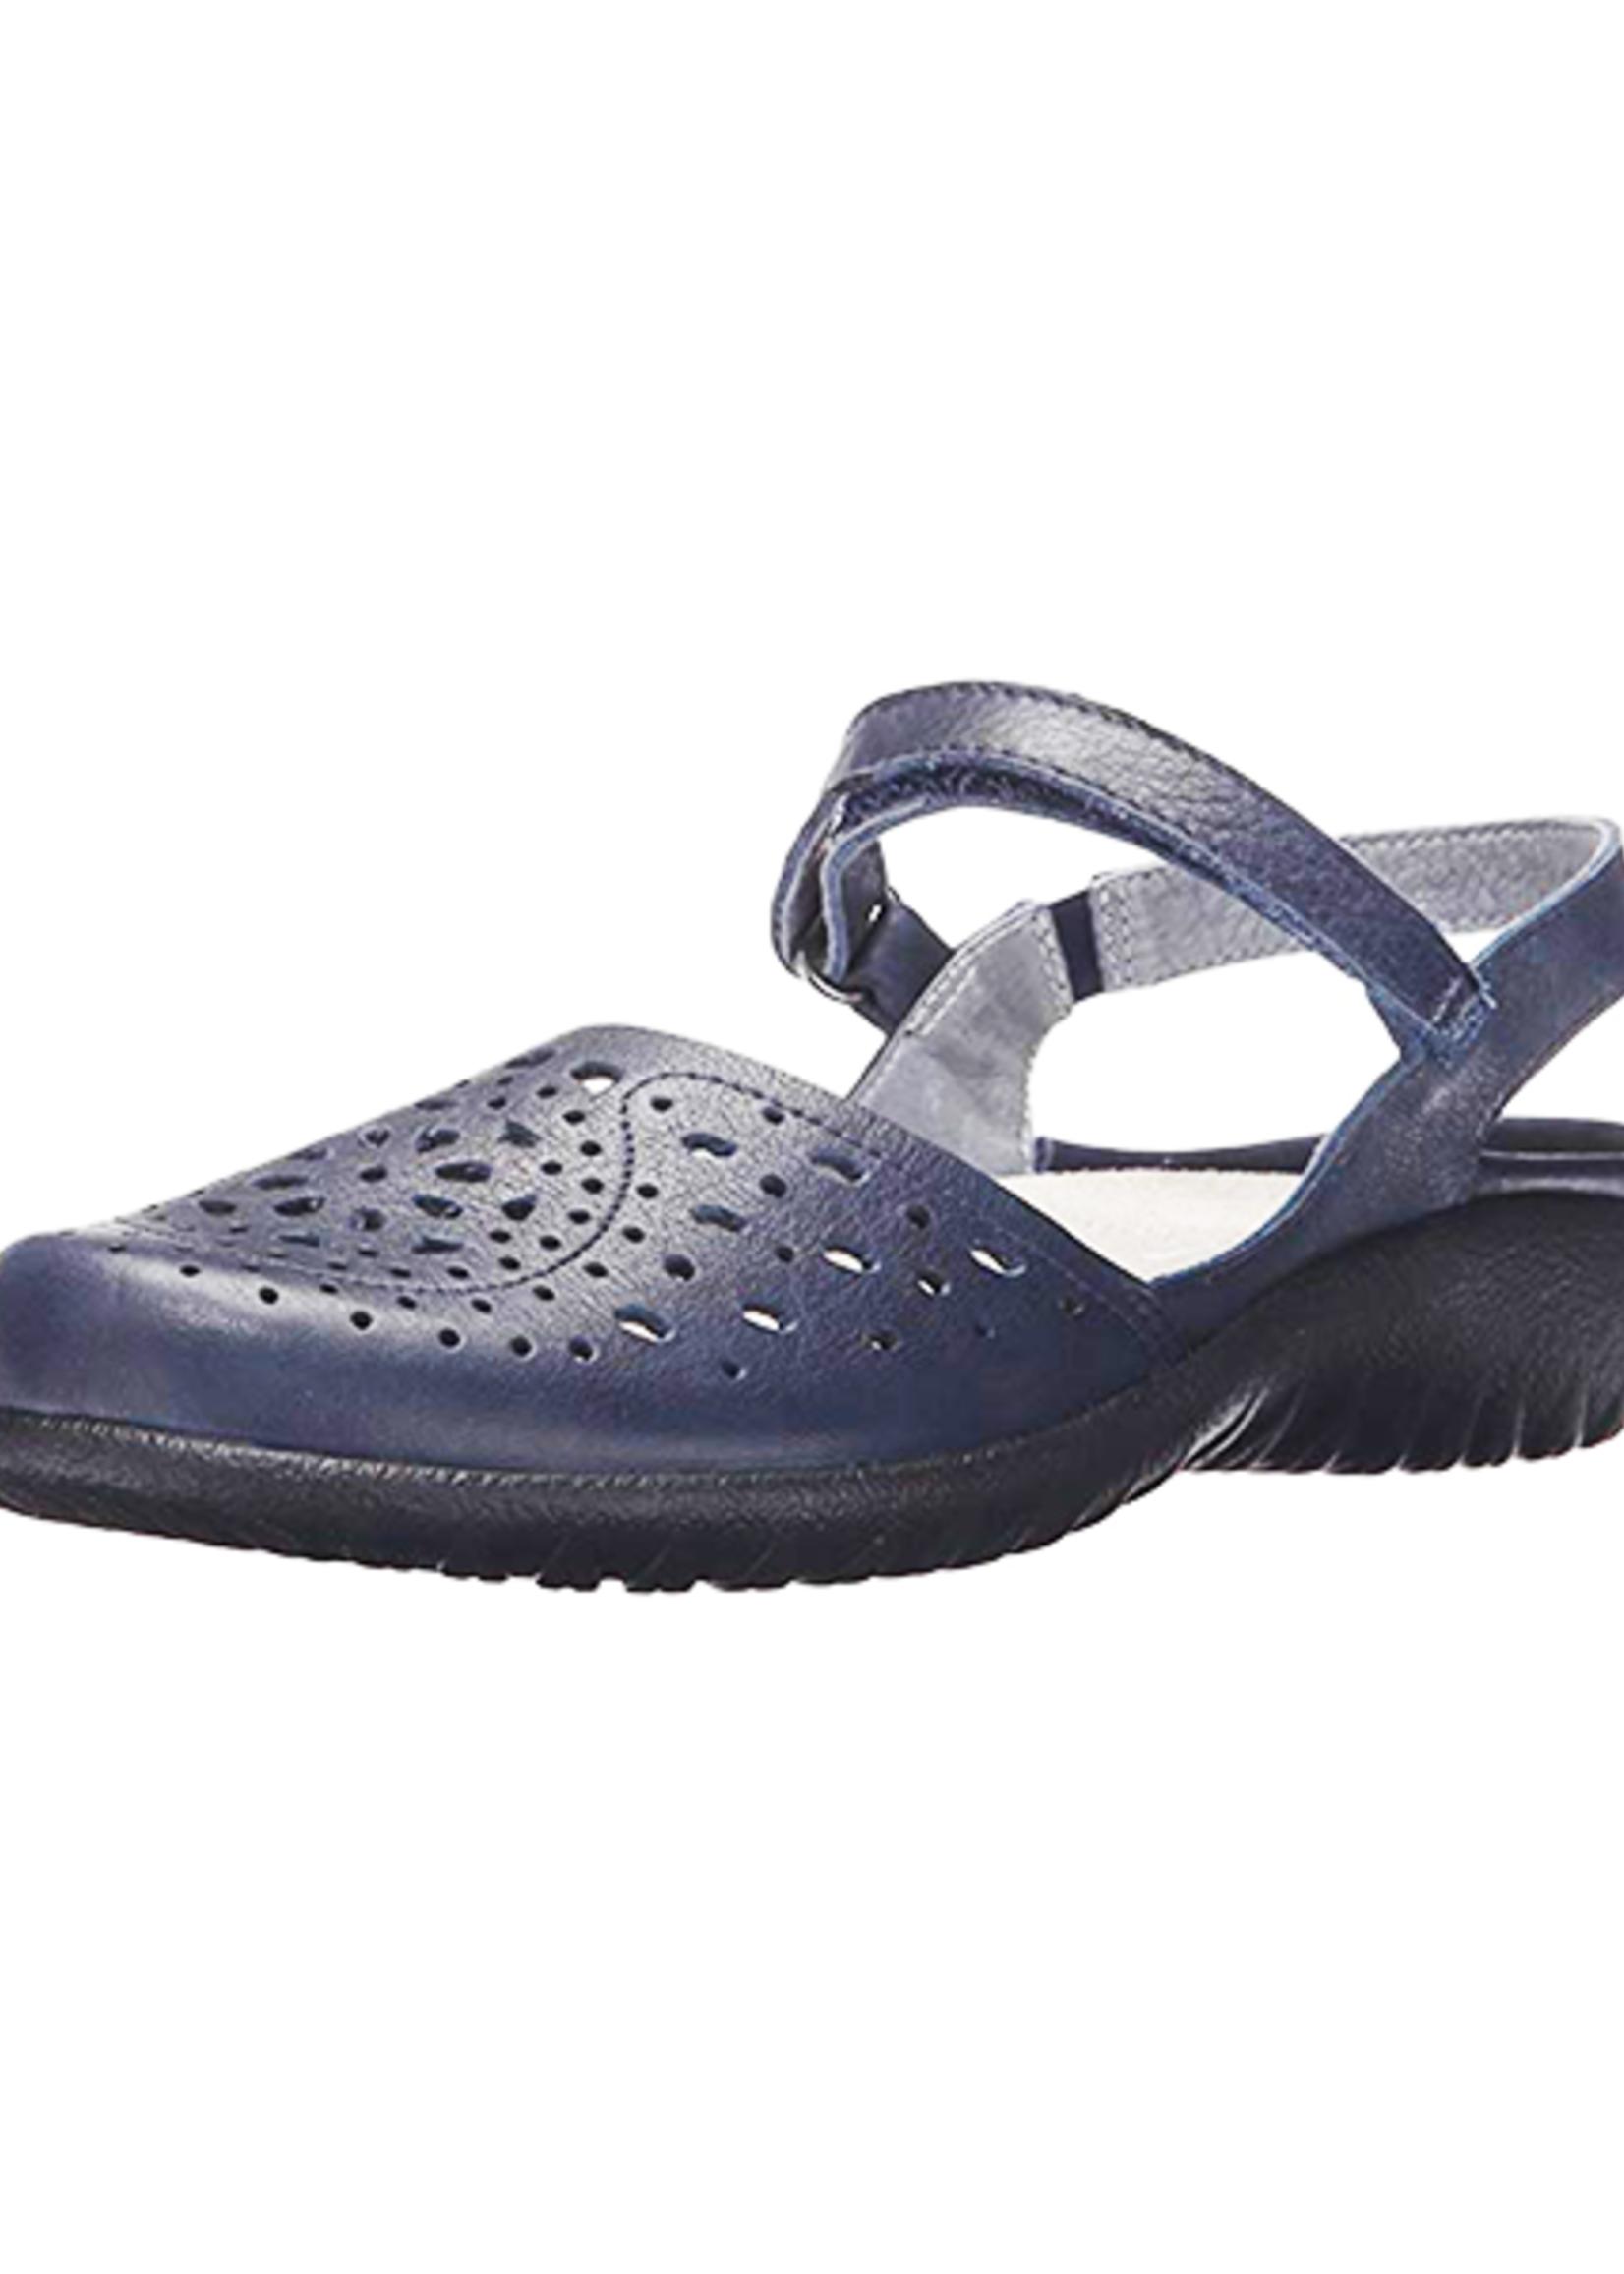 Naot Footwear Arataki in Ink Leather